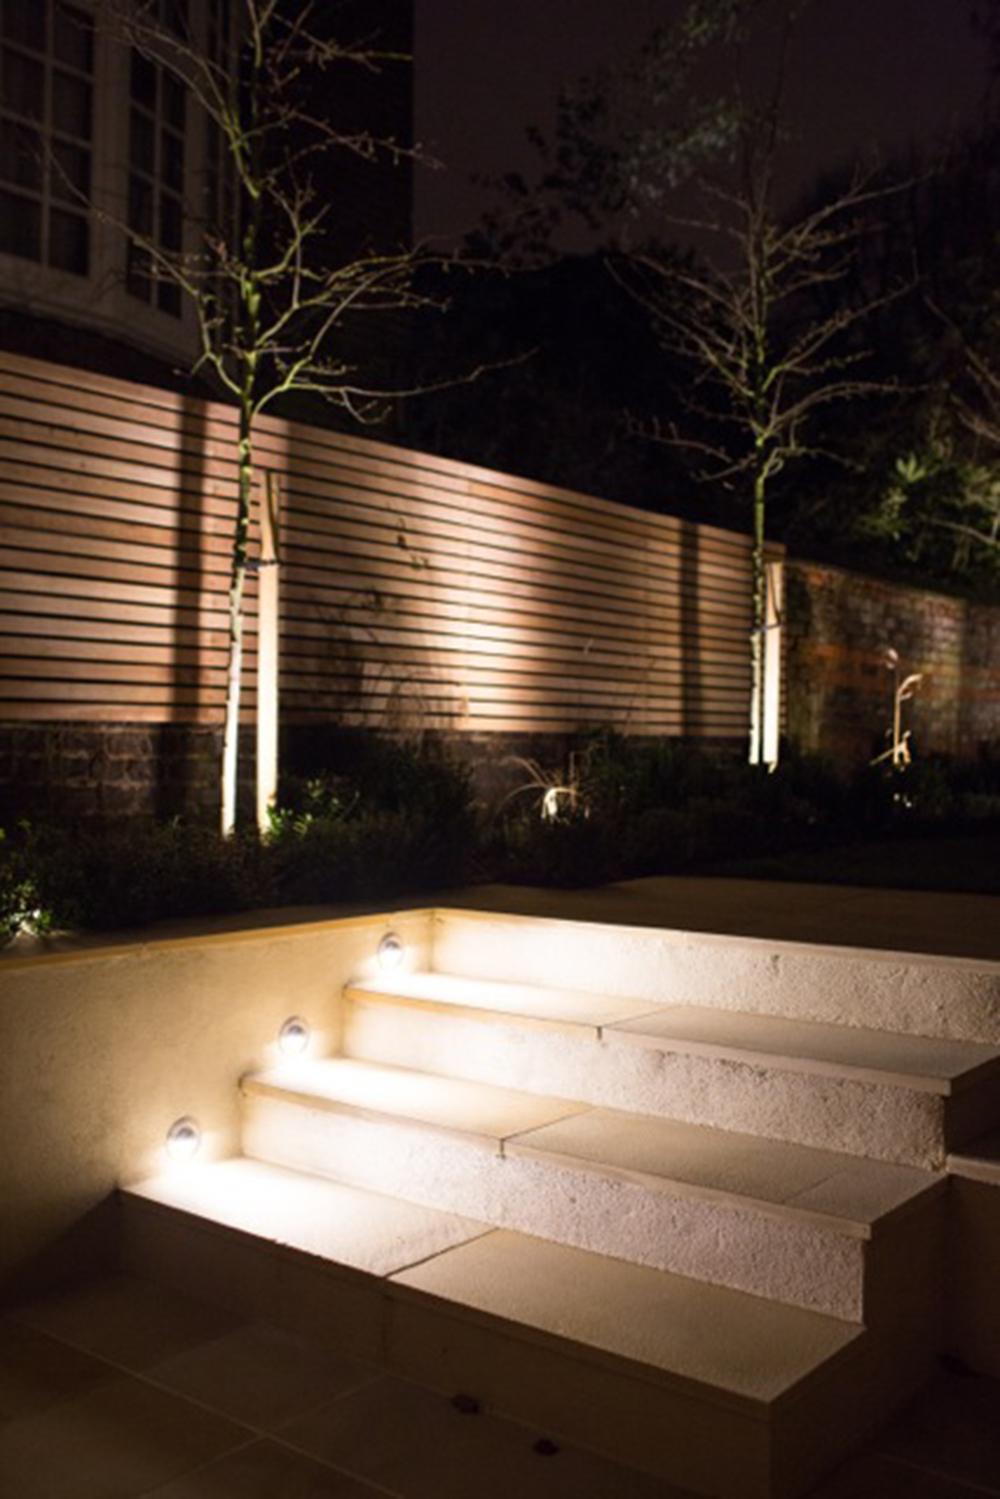 Contemporary garden in north london showing a range of for Garden design job vacancies london